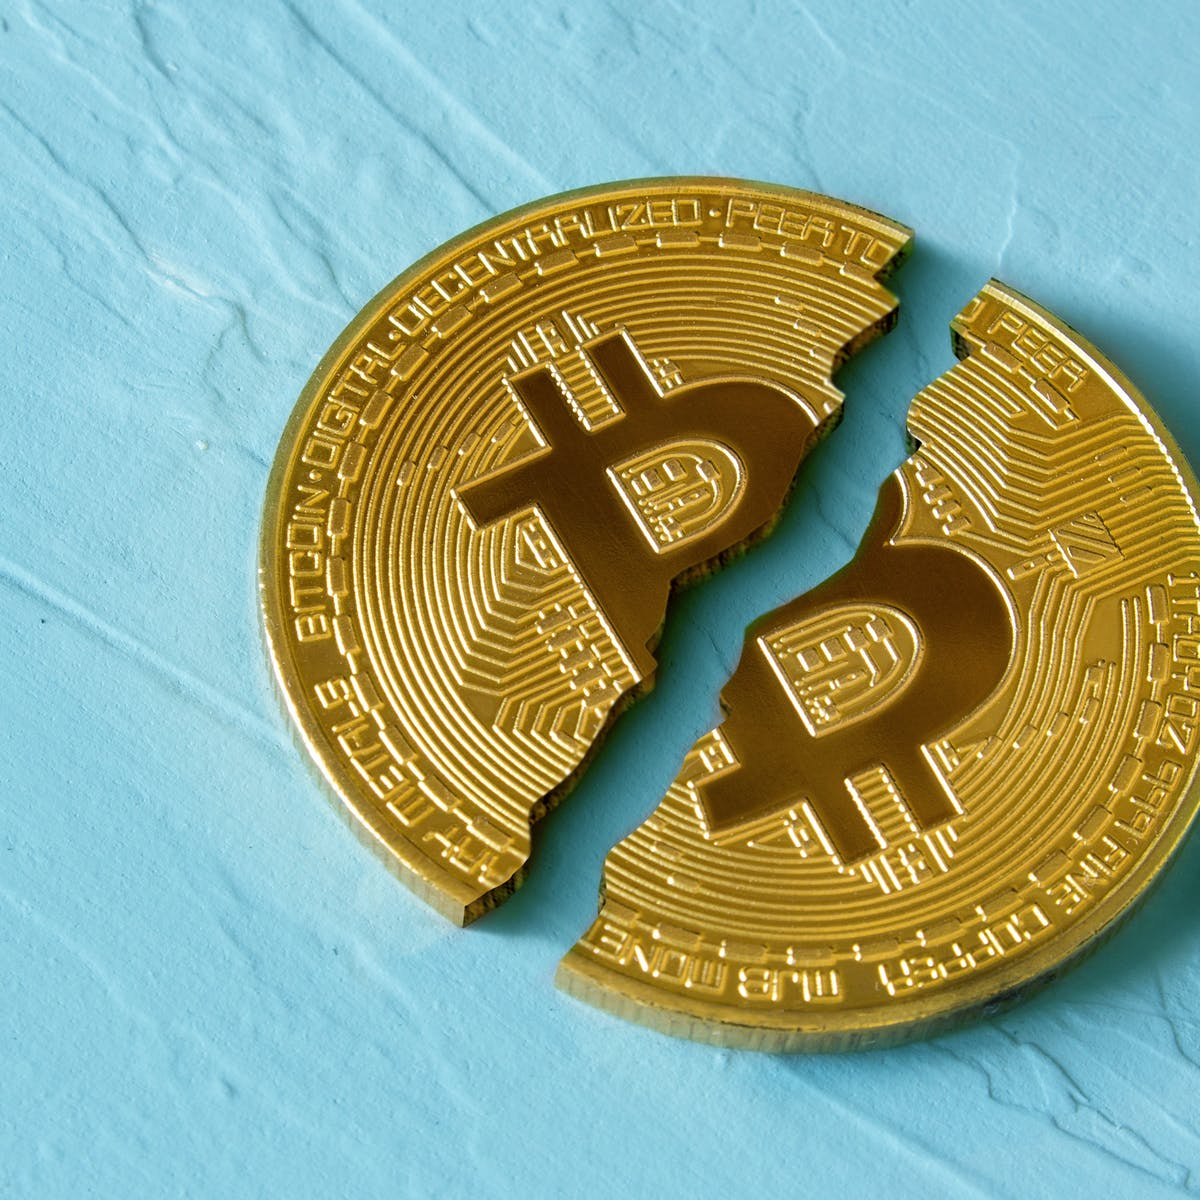 Bitcoins worthless coin bet9ja nigeria sport betting premier